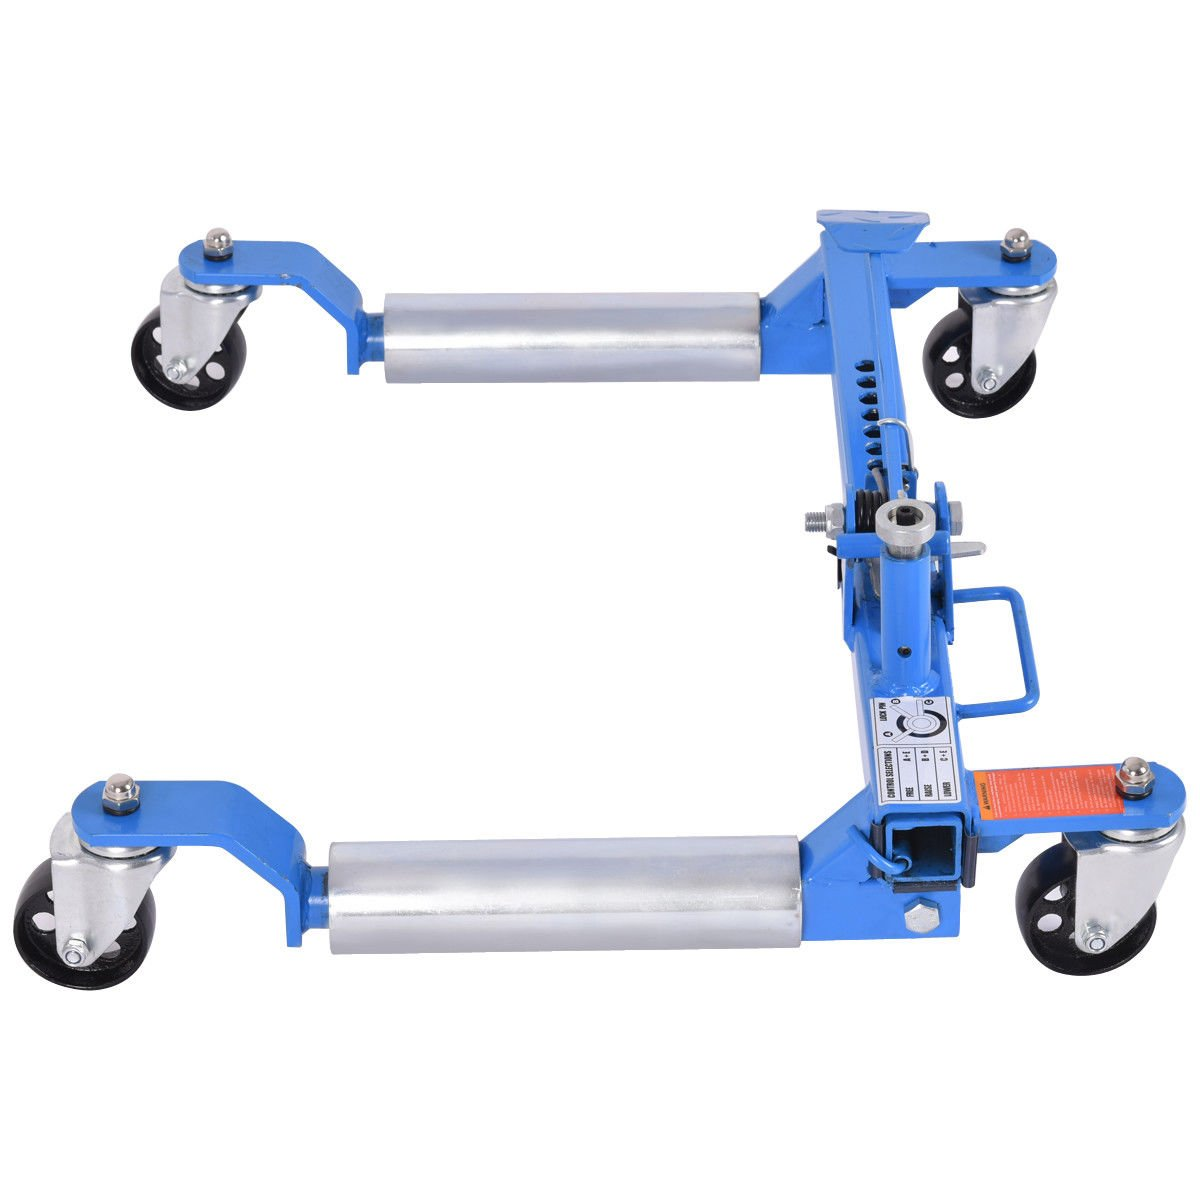 Goplus Wheel Dolly Car Skates Vehicle Positioning Hydraulic Tire Jack, 1250 lb (Blue) by Goplus (Image #4)